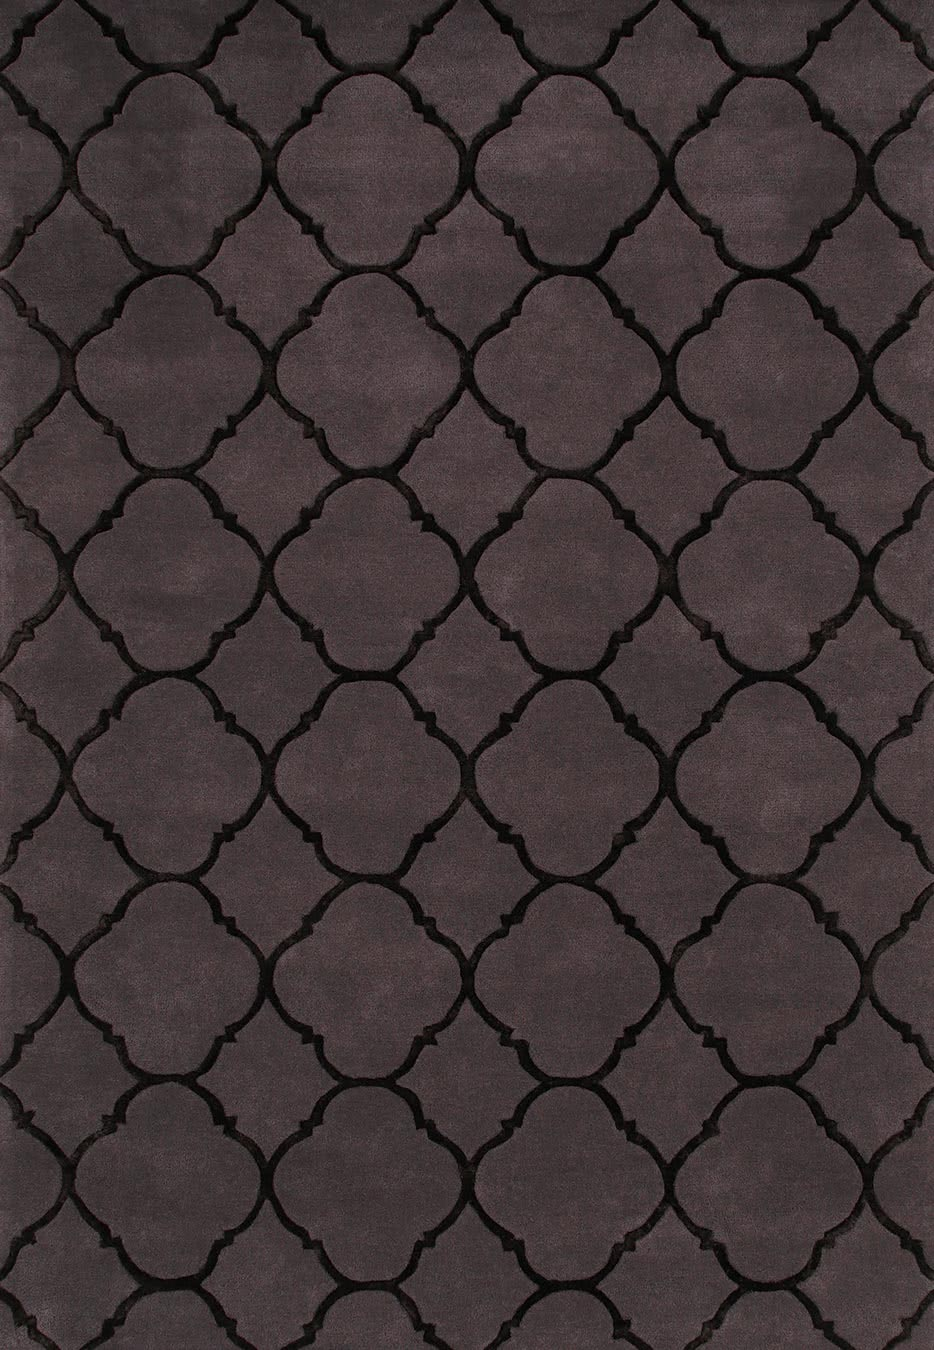 Istanbul rug in dark grey colourway overhead image